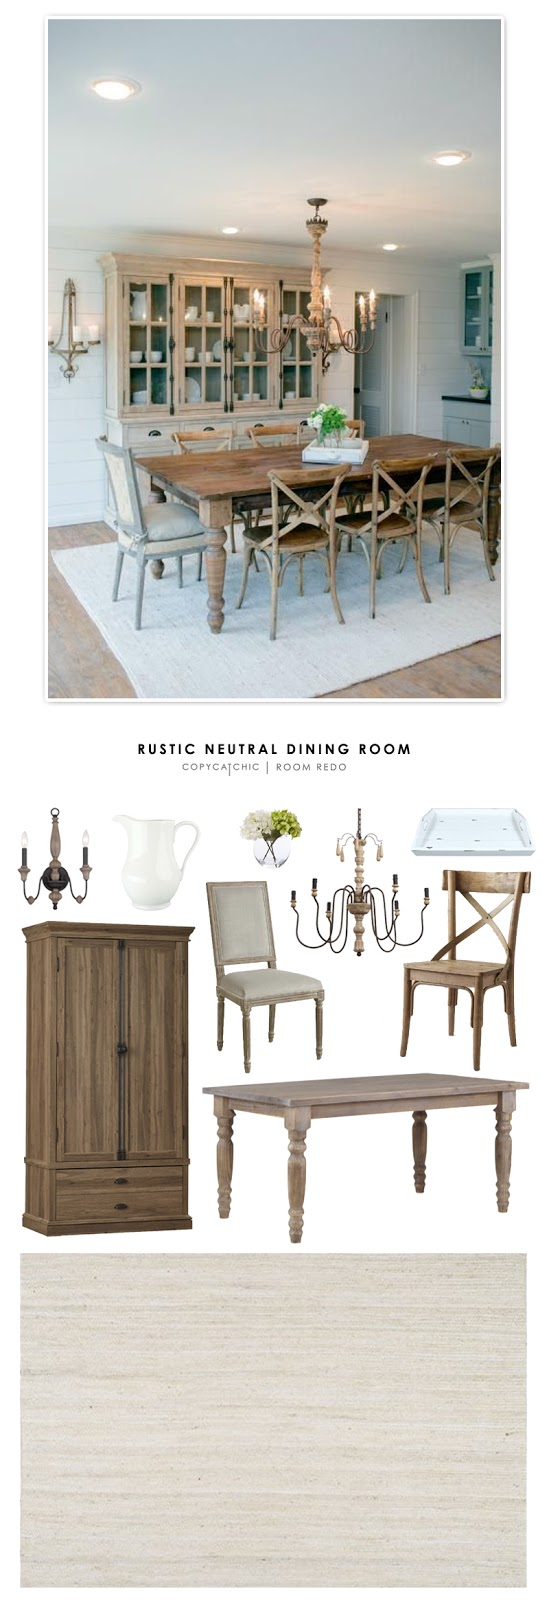 Copy Cat Chic Room Redo Rustic Neutral Dining Room